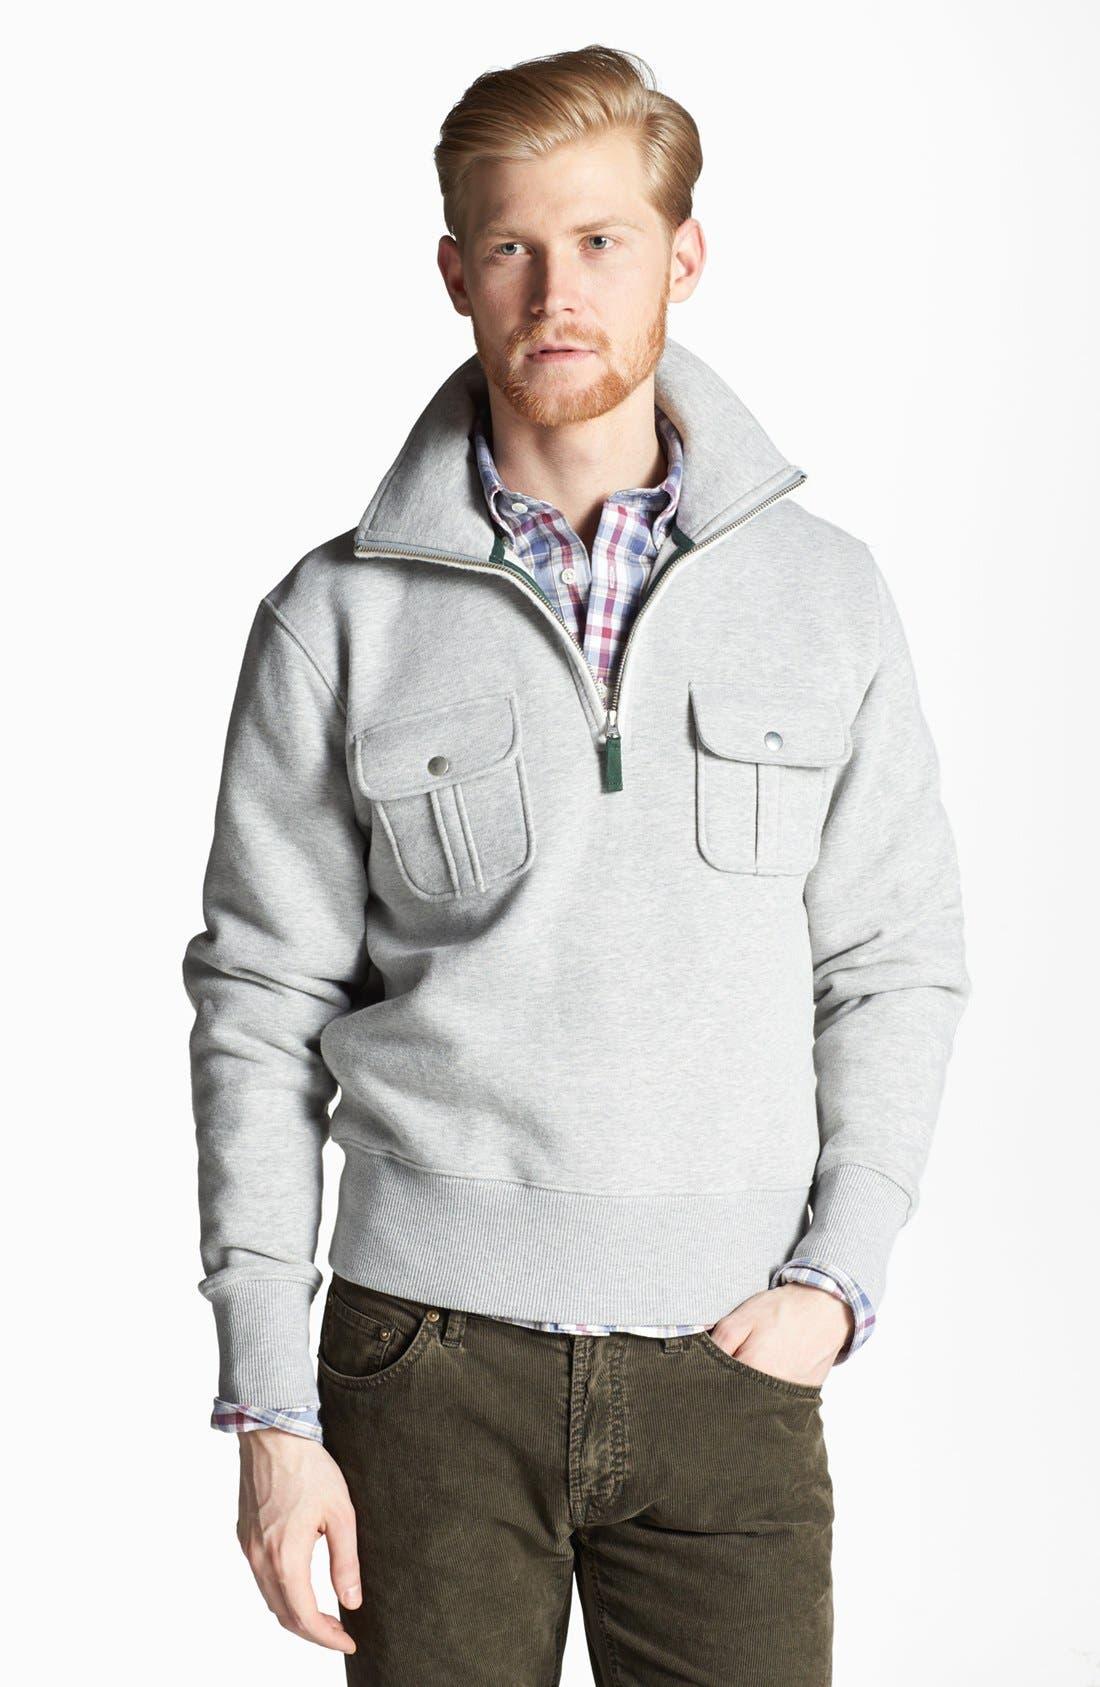 Alternate Image 1 Selected - Gant by Michael Bastian Half-Zip Pullover Sweatshirt